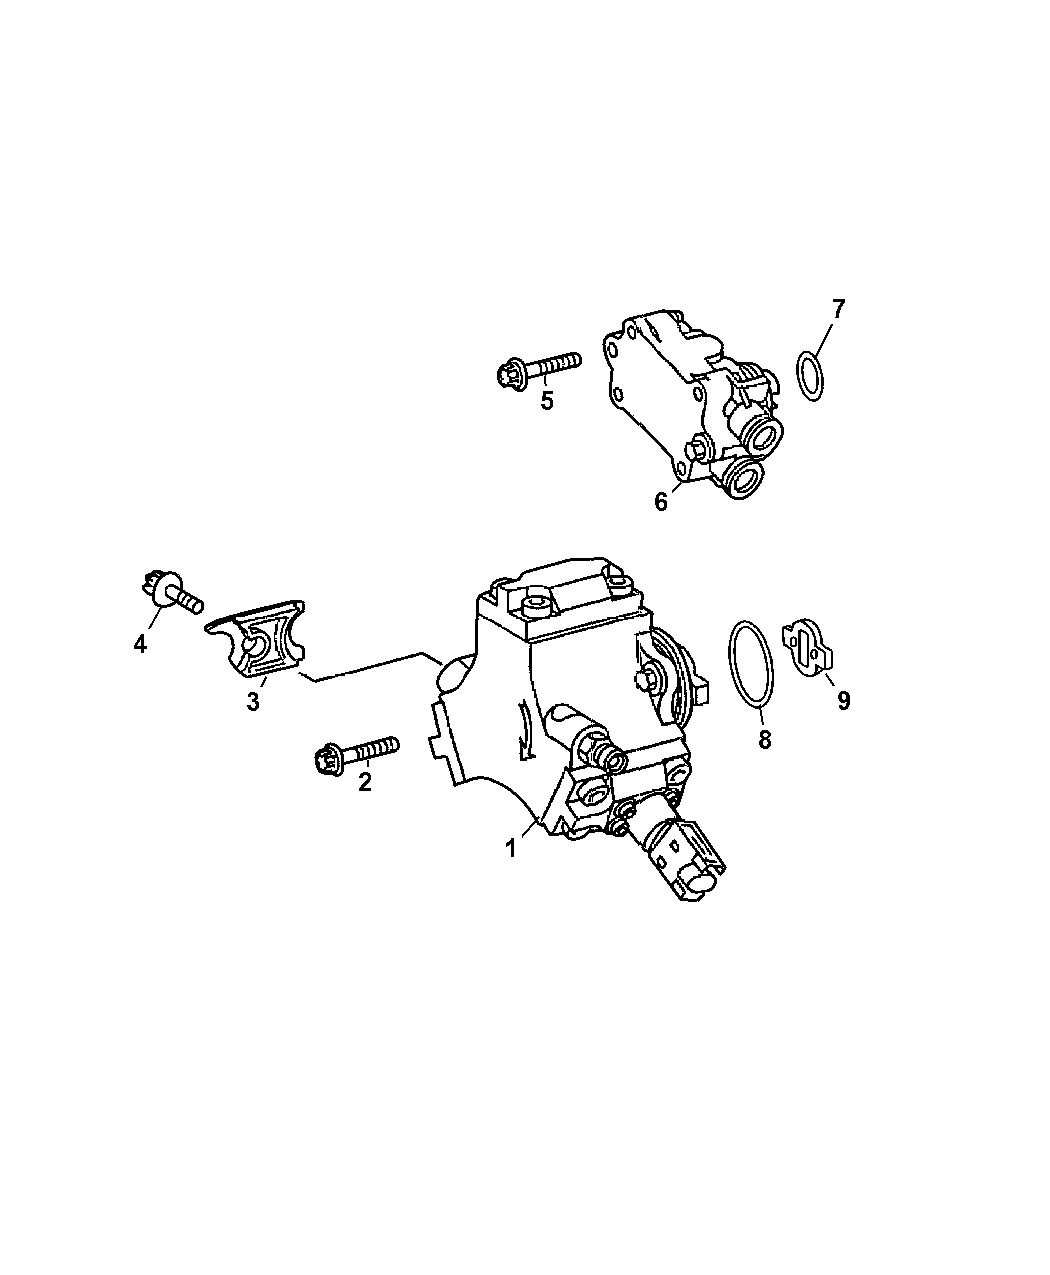 Dodge Sprinter Fuel Injection Pump